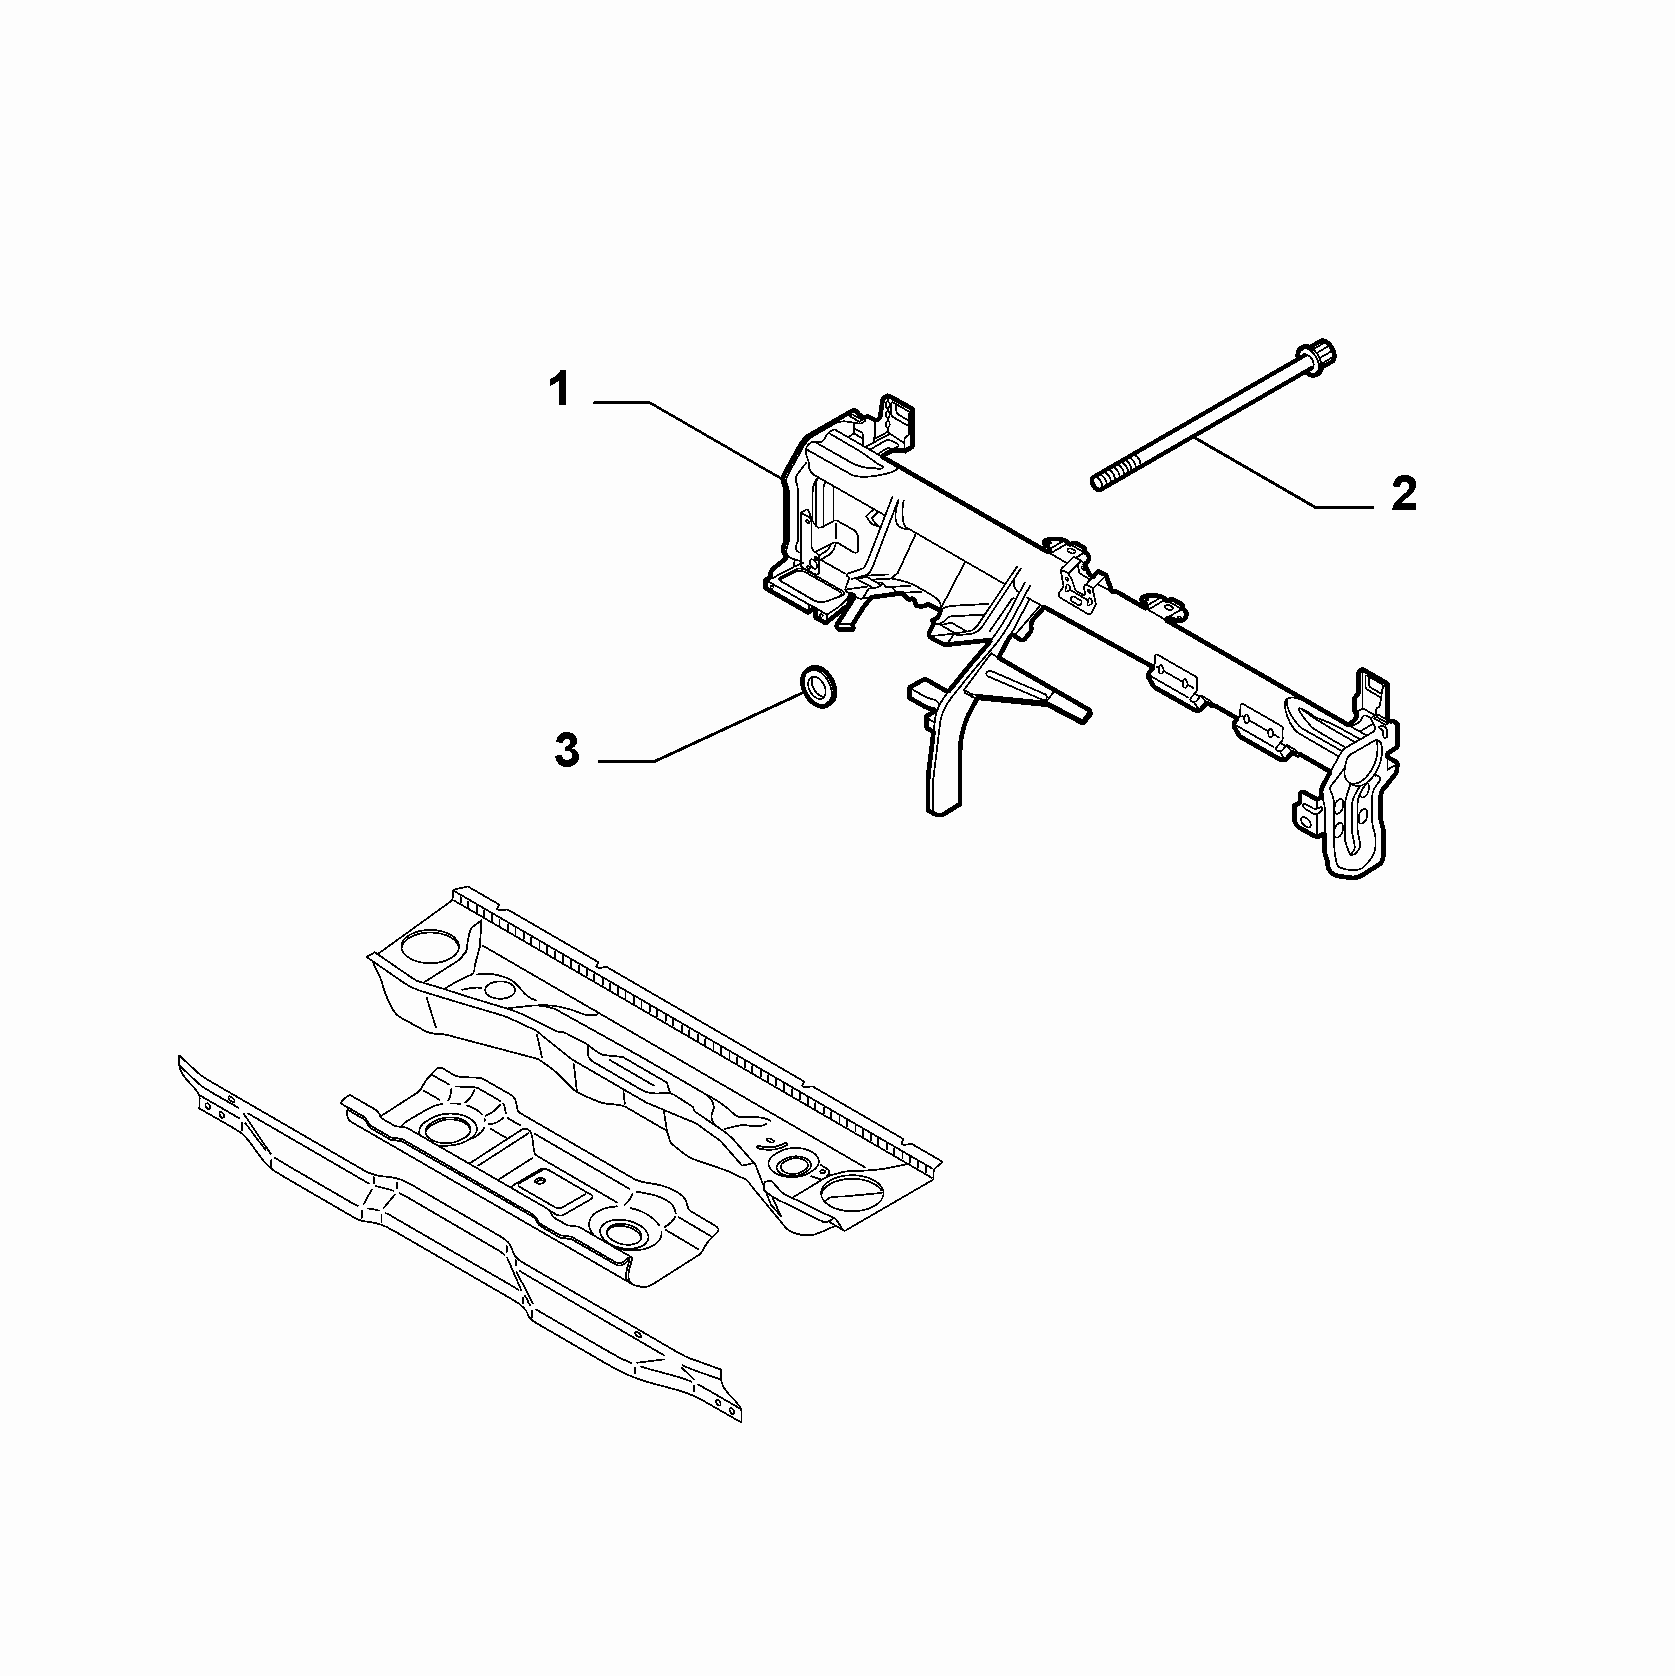 70002-050 DASHBOARD CROSSRAIL